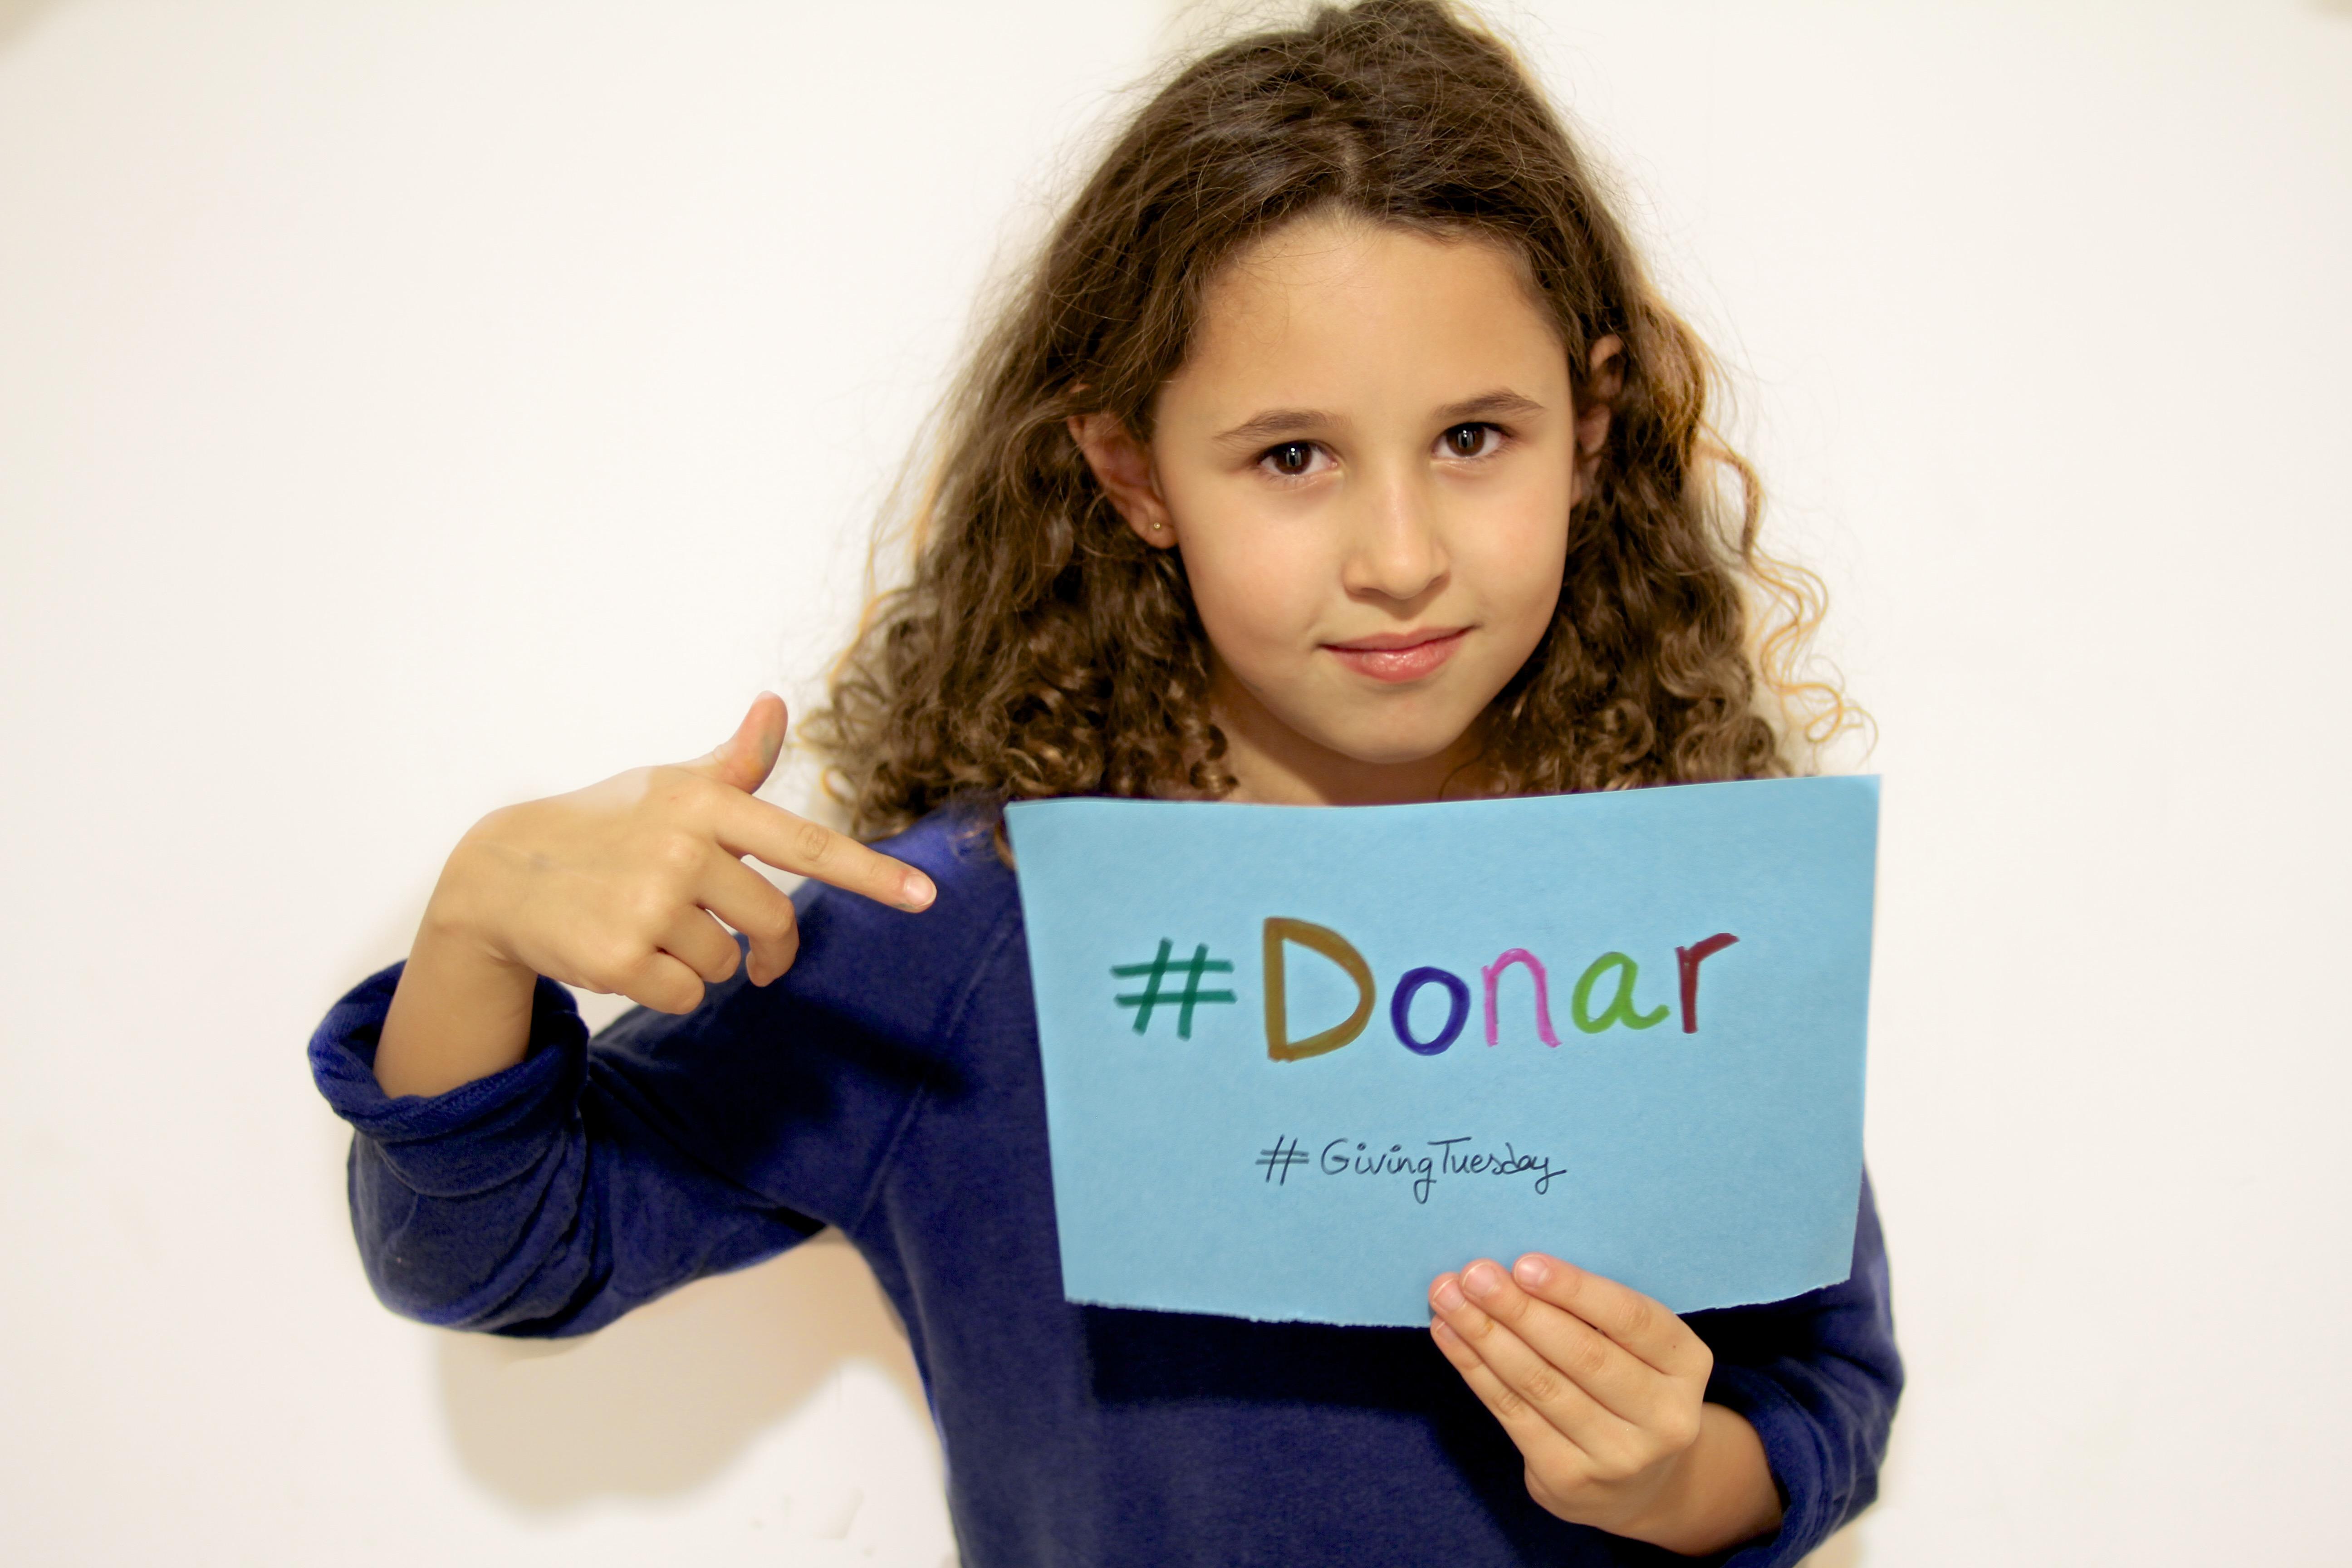 la caixa-donar-obra-social-lacaixa-descalzaporelparque-blogger-kids-solidaridad-givingtuesday